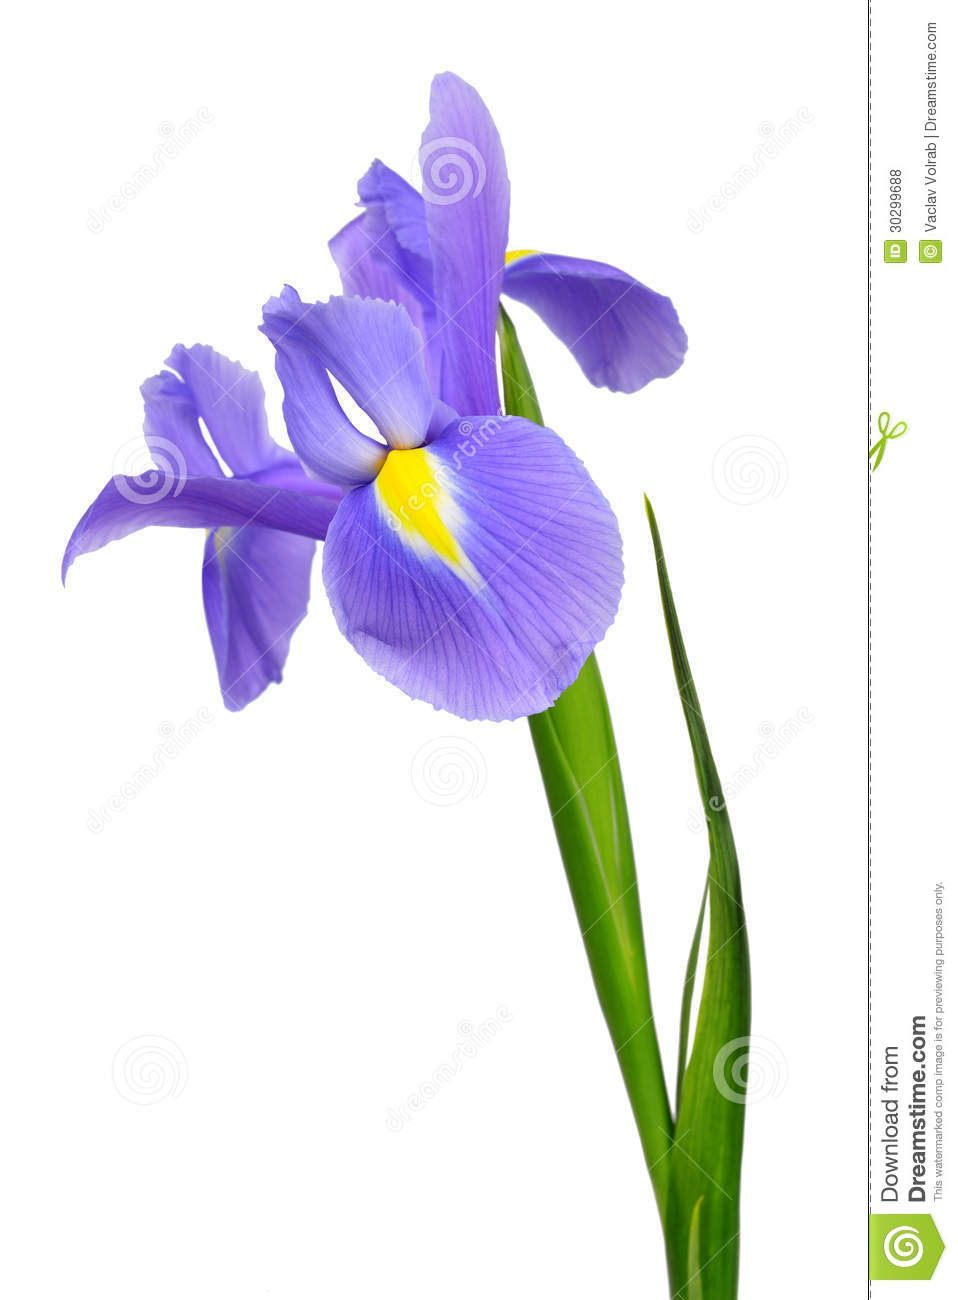 Purple iris flower royalty free stock photos image 30299688 flower purple iris flower royalty free izmirmasajfo Images